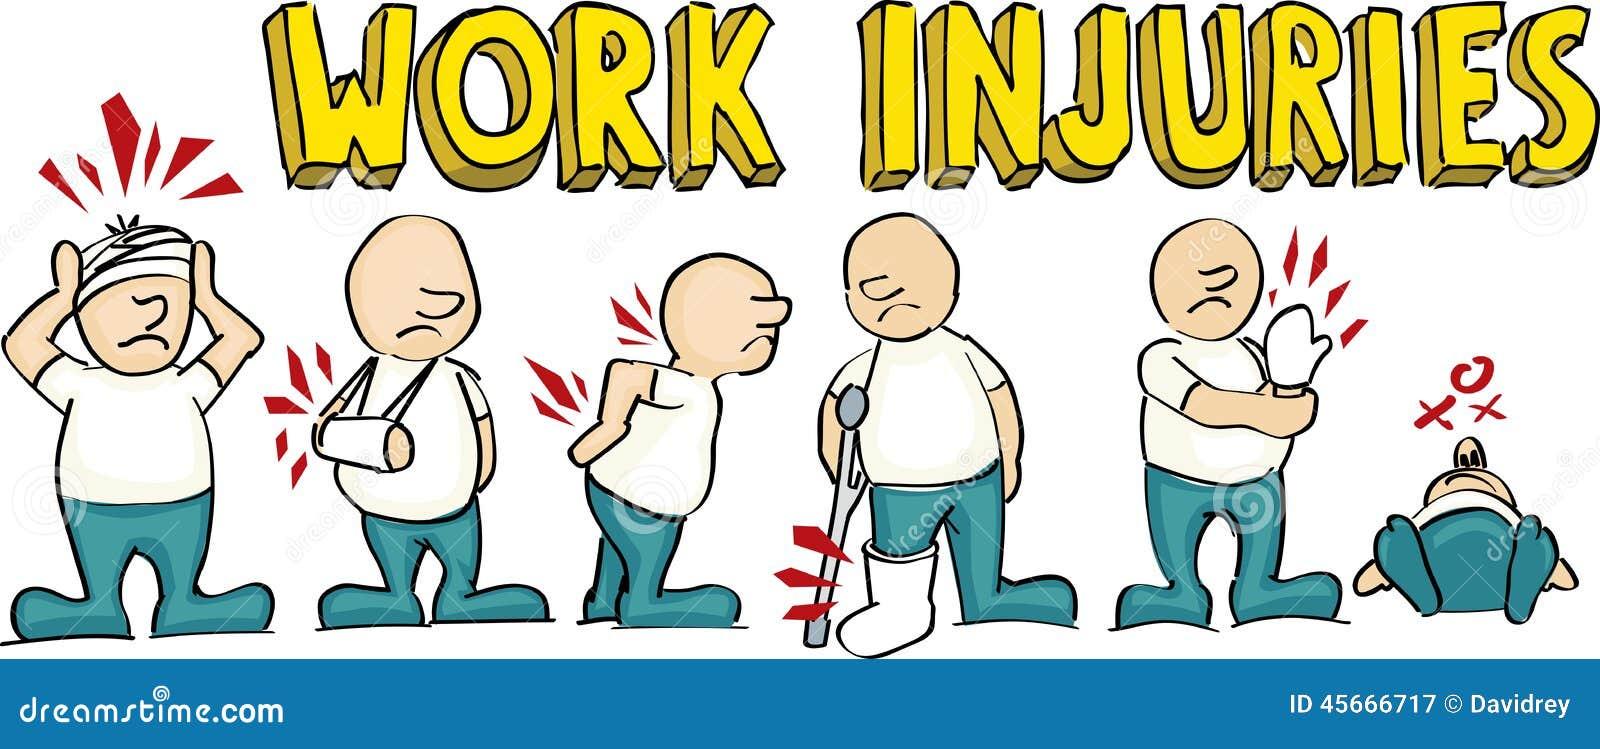 sport injury clipart - photo #26